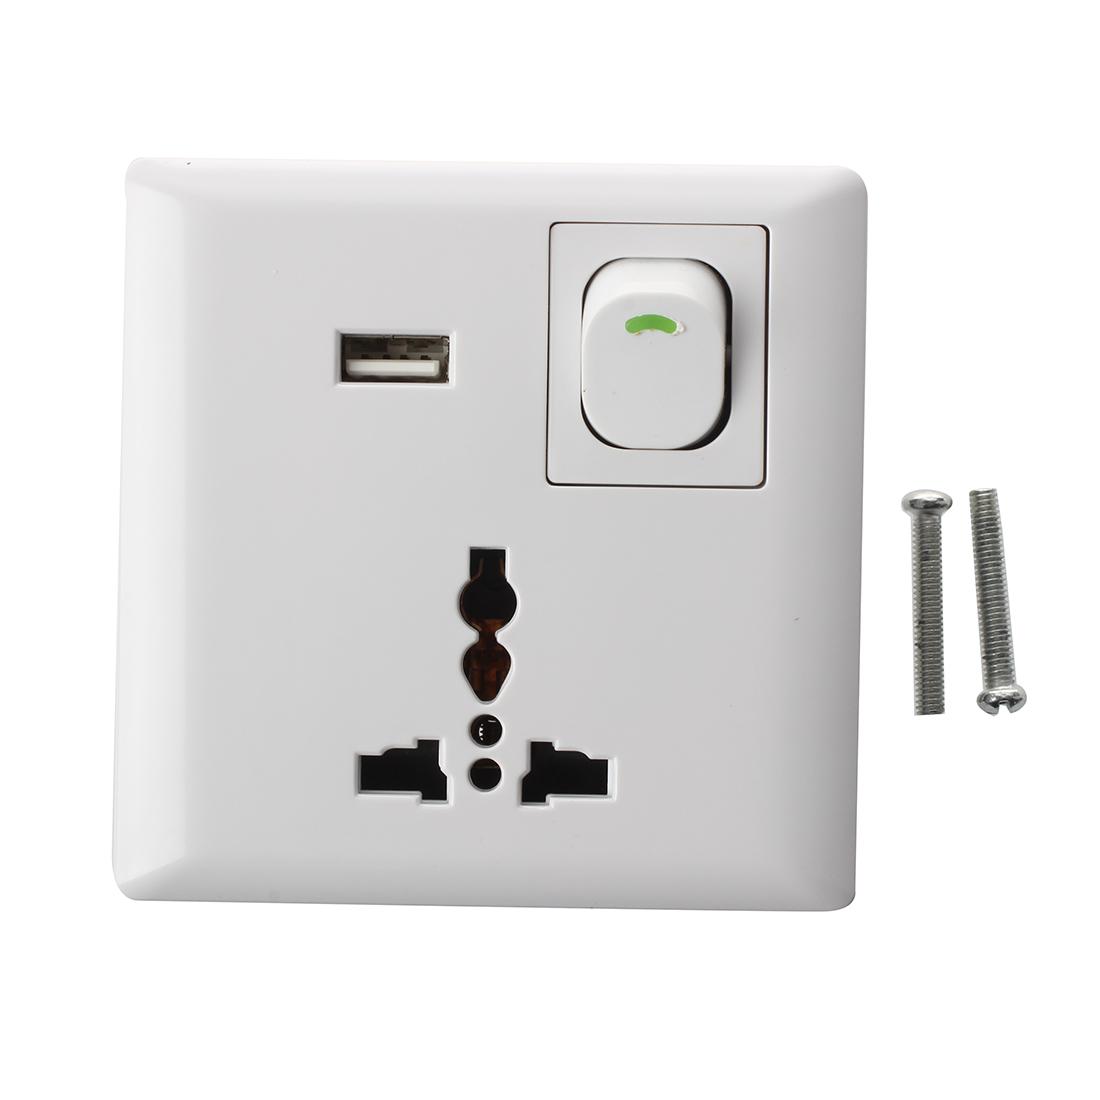 Base enchufe usb con interruptor 10a 250v pared color - Enchufes con usb ...